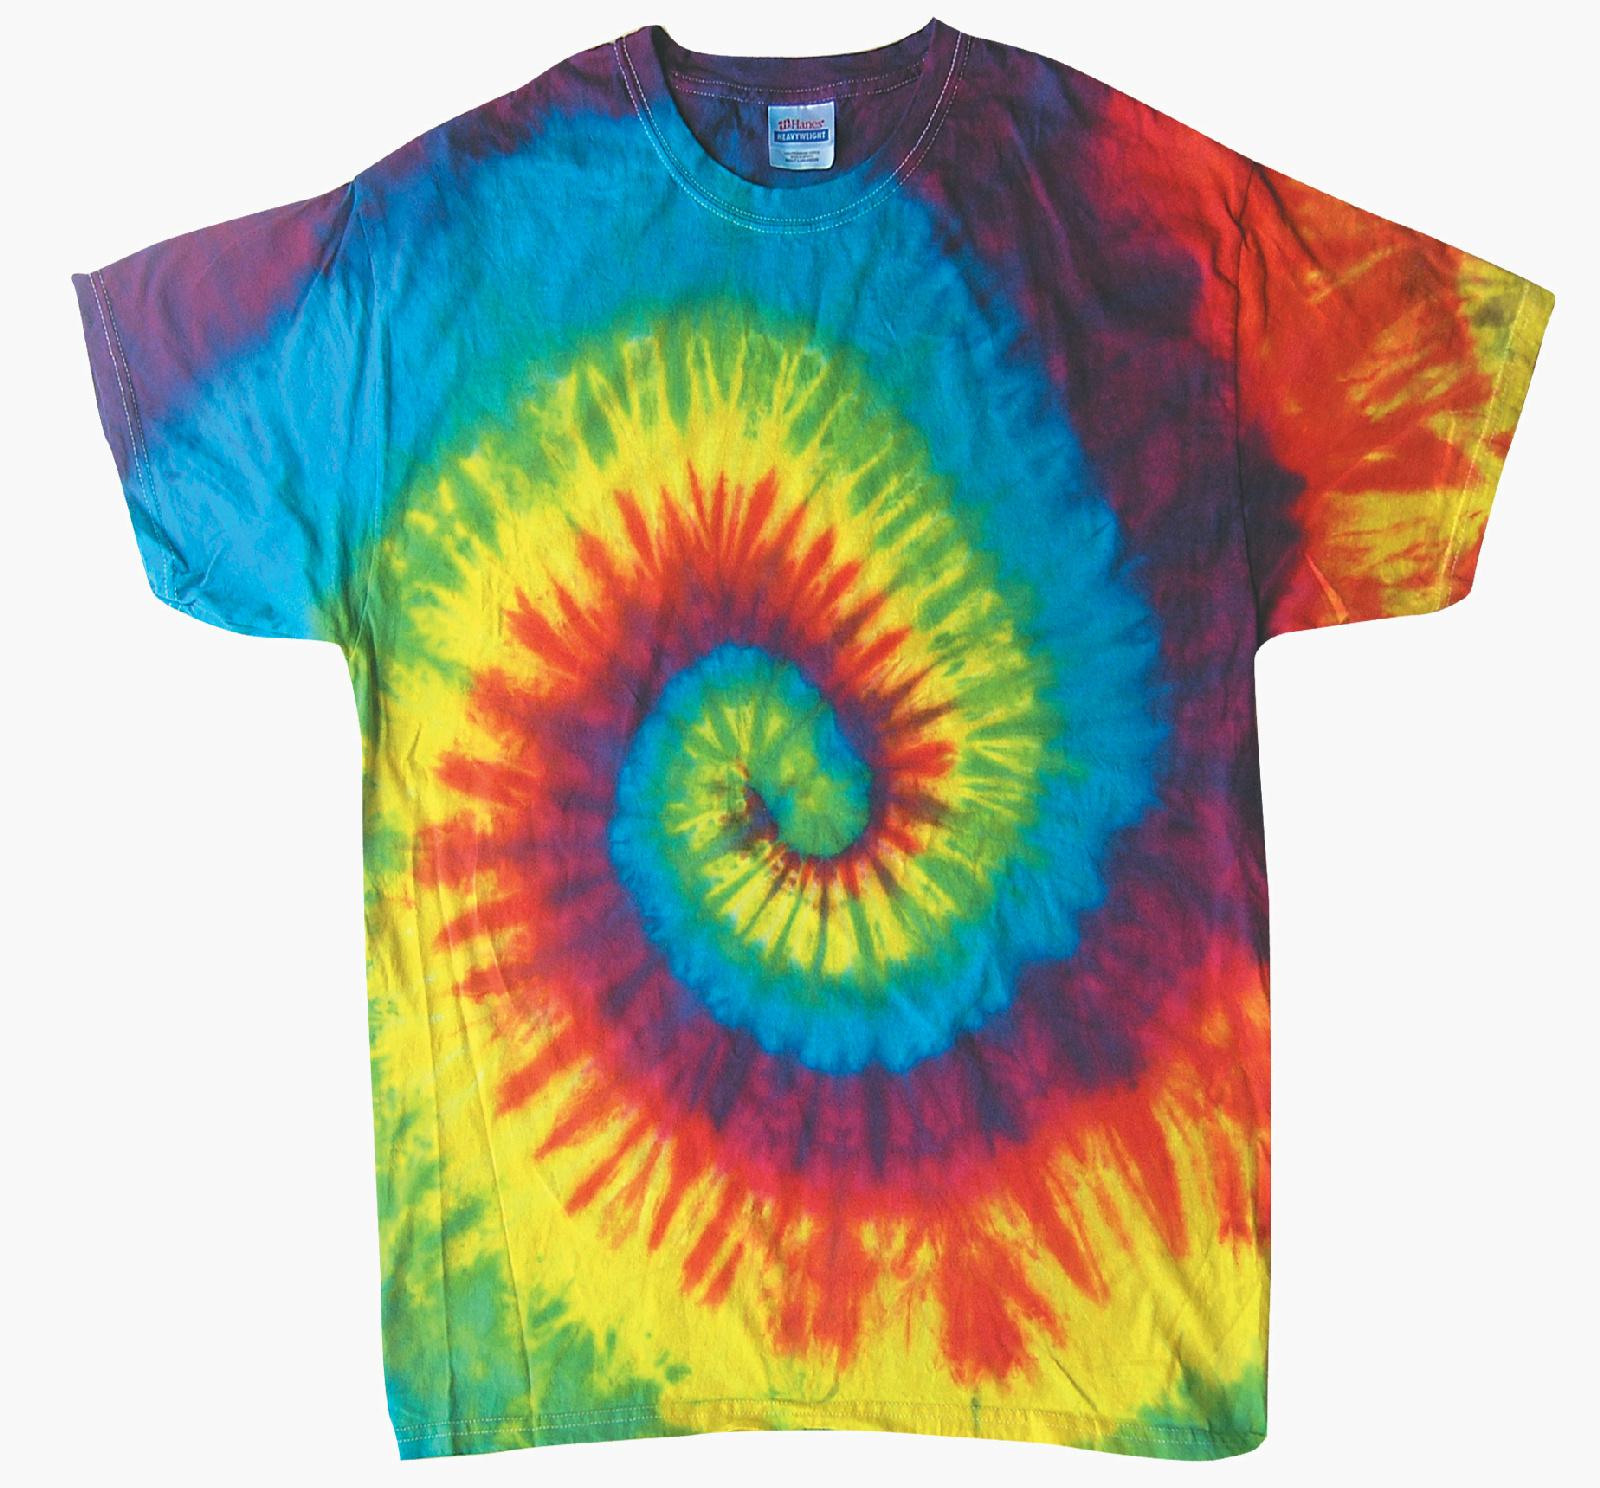 da667d5d660 Adult Tie Dye Short Sleeve T Shirt New Reactive Rainbow Multi Color Spiral  Small